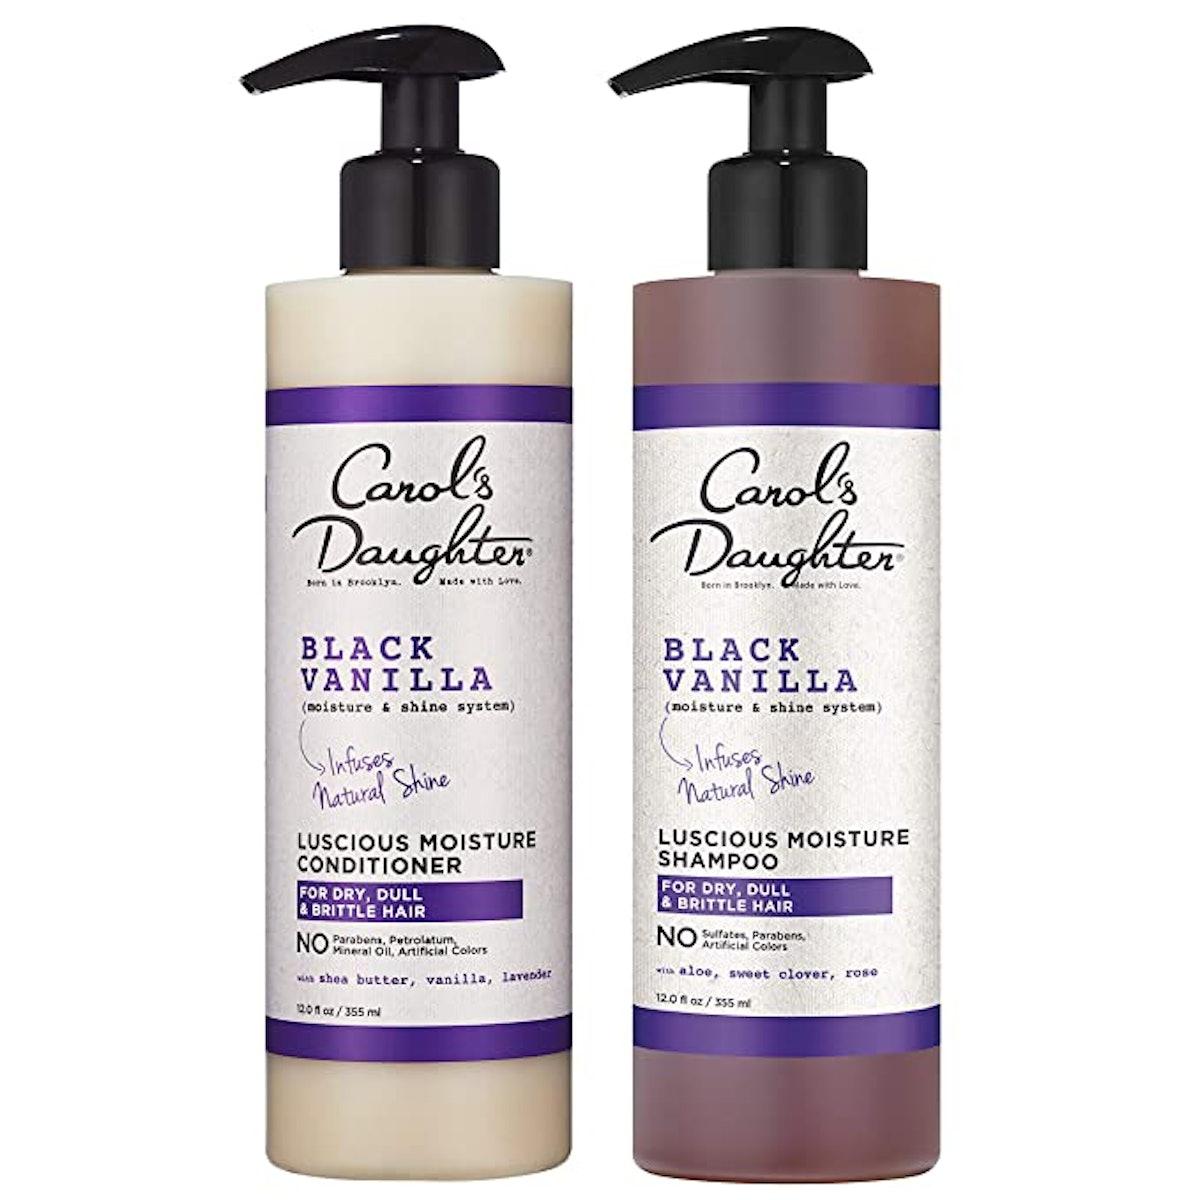 Carol's Daughter Black Vanilla Moisture and Shine Shampoo and Conditioner Set